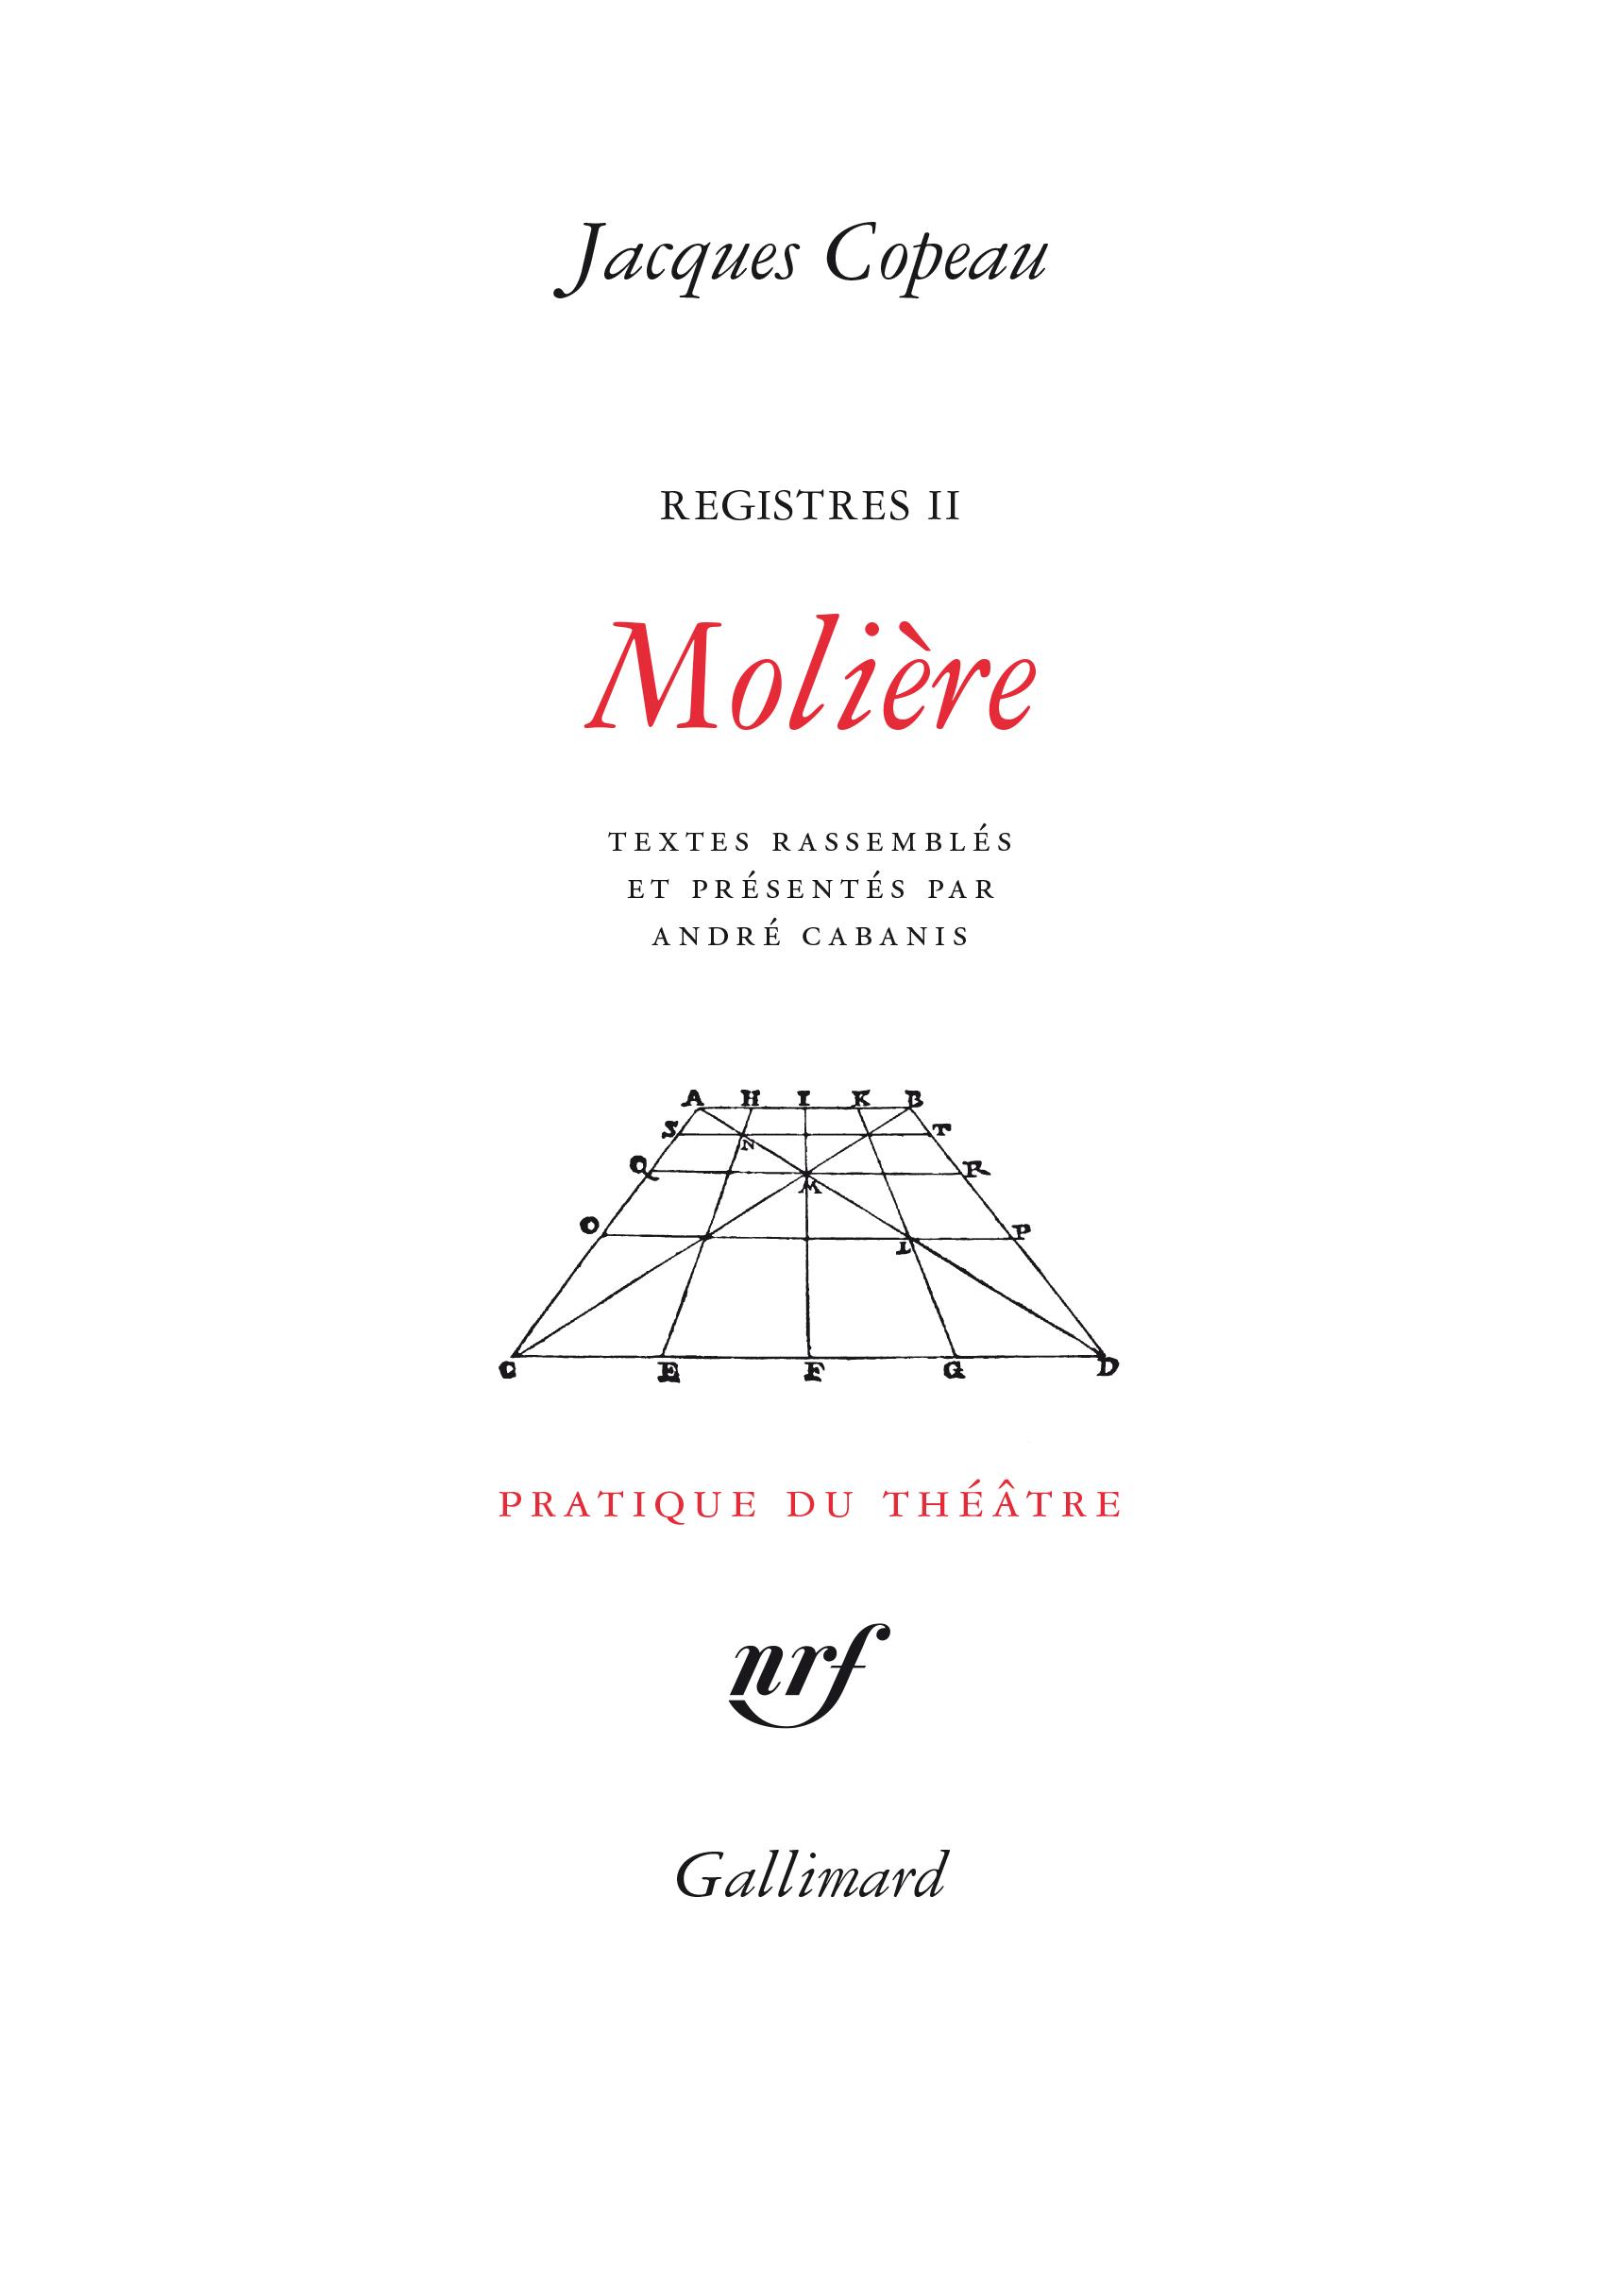 REGISTRES, II : MOLIERE